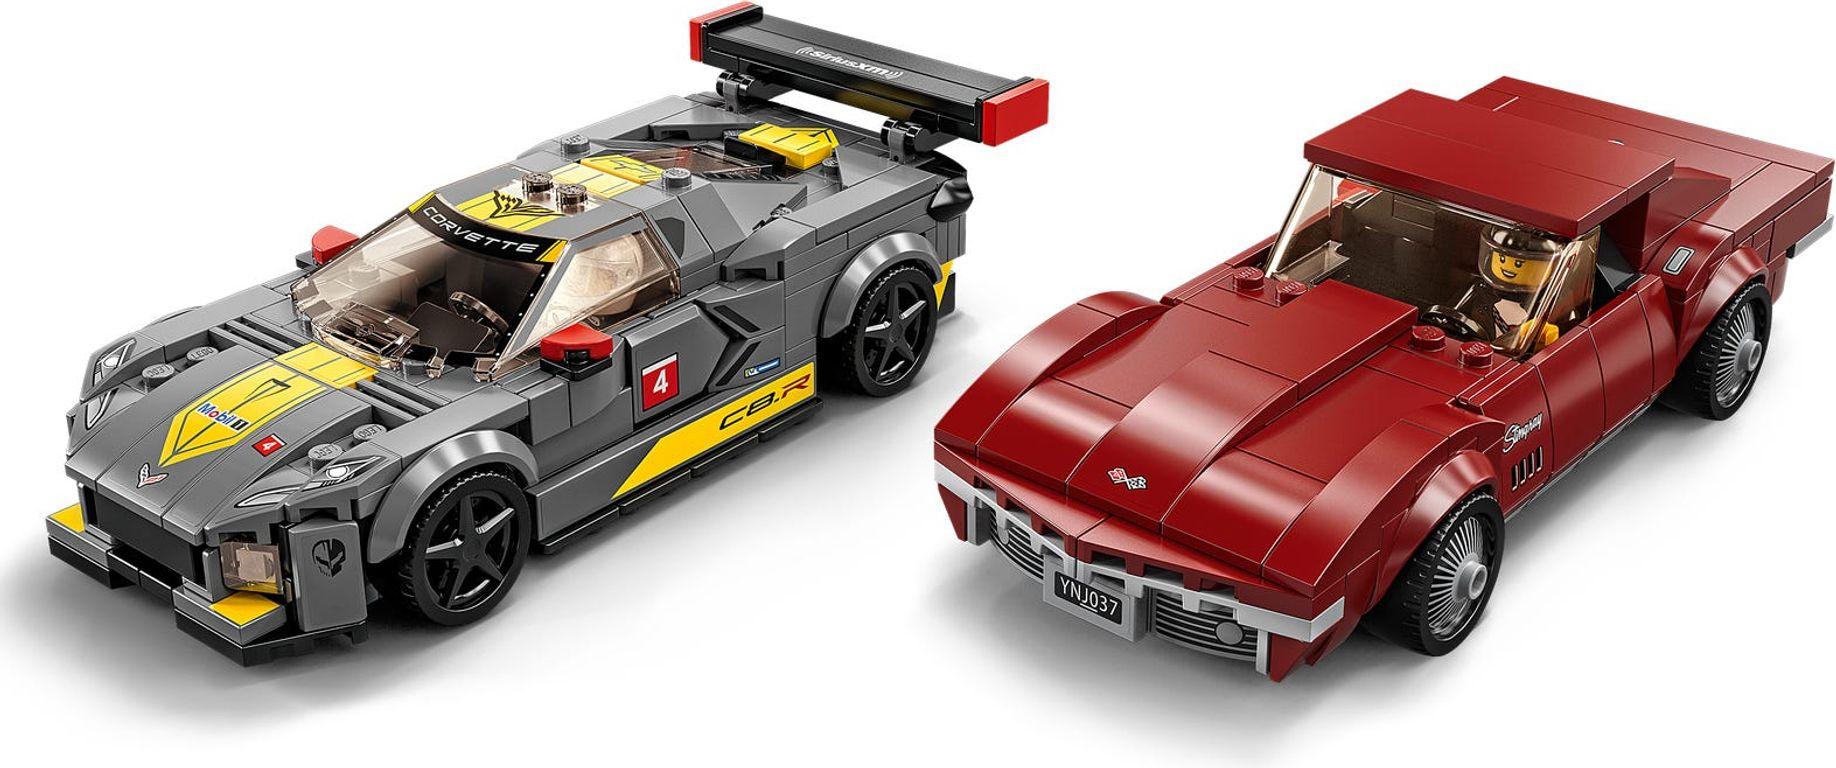 LEGO® Speed Champions Chevrolet Corvette C8.R Race Car and 1968 Chevrolet Corvette gameplay